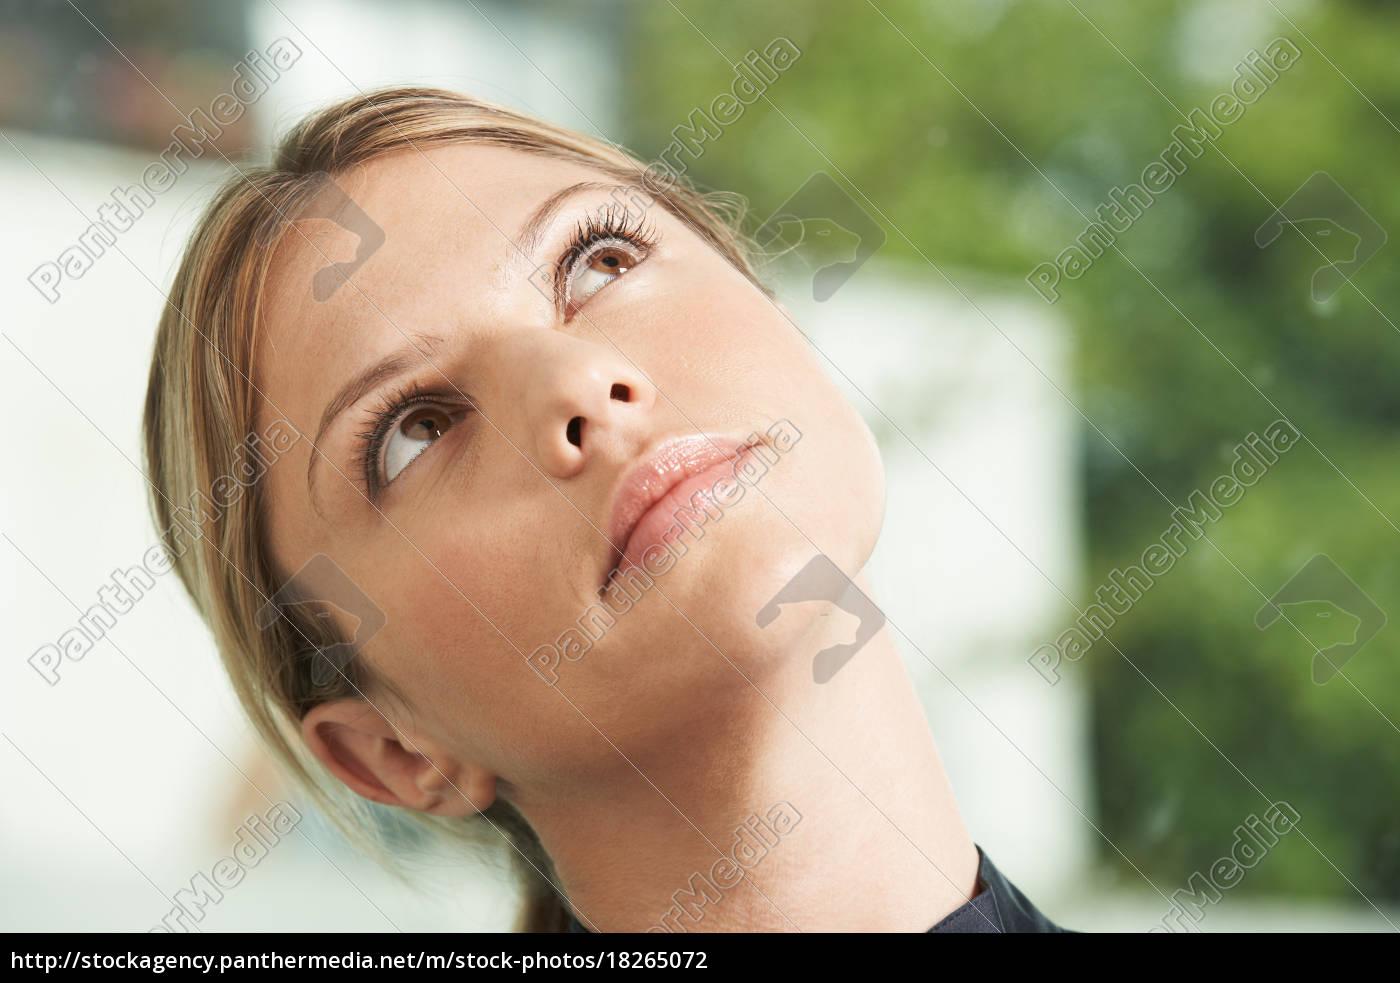 close-up, portrait, of, business, woman. - 18265072